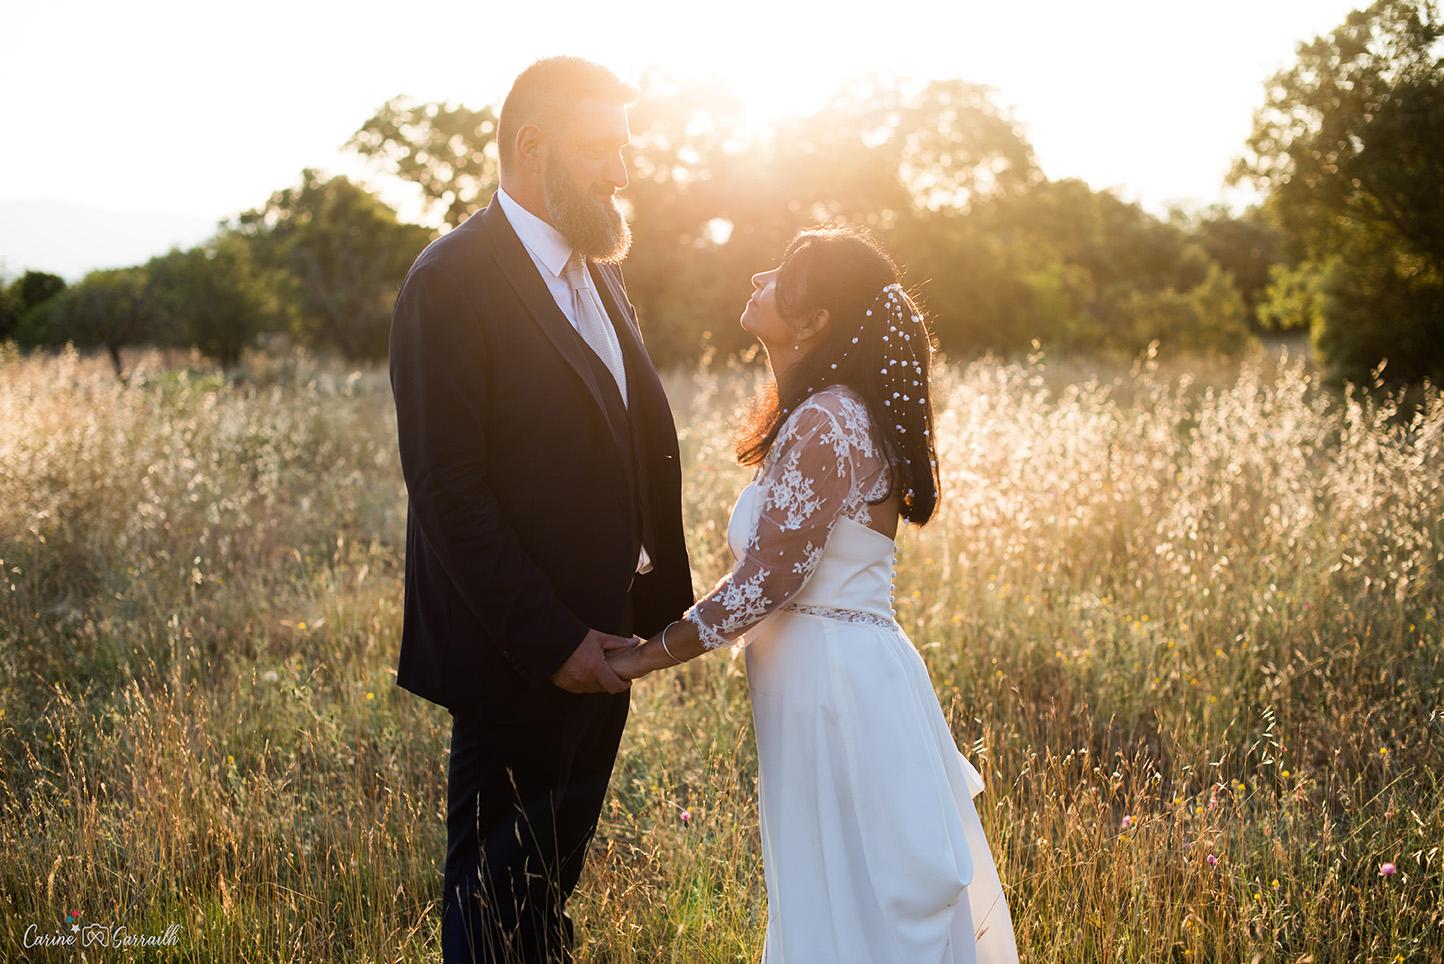 2018-07-14-Photographe-mariage-mas-de-baumes-181web